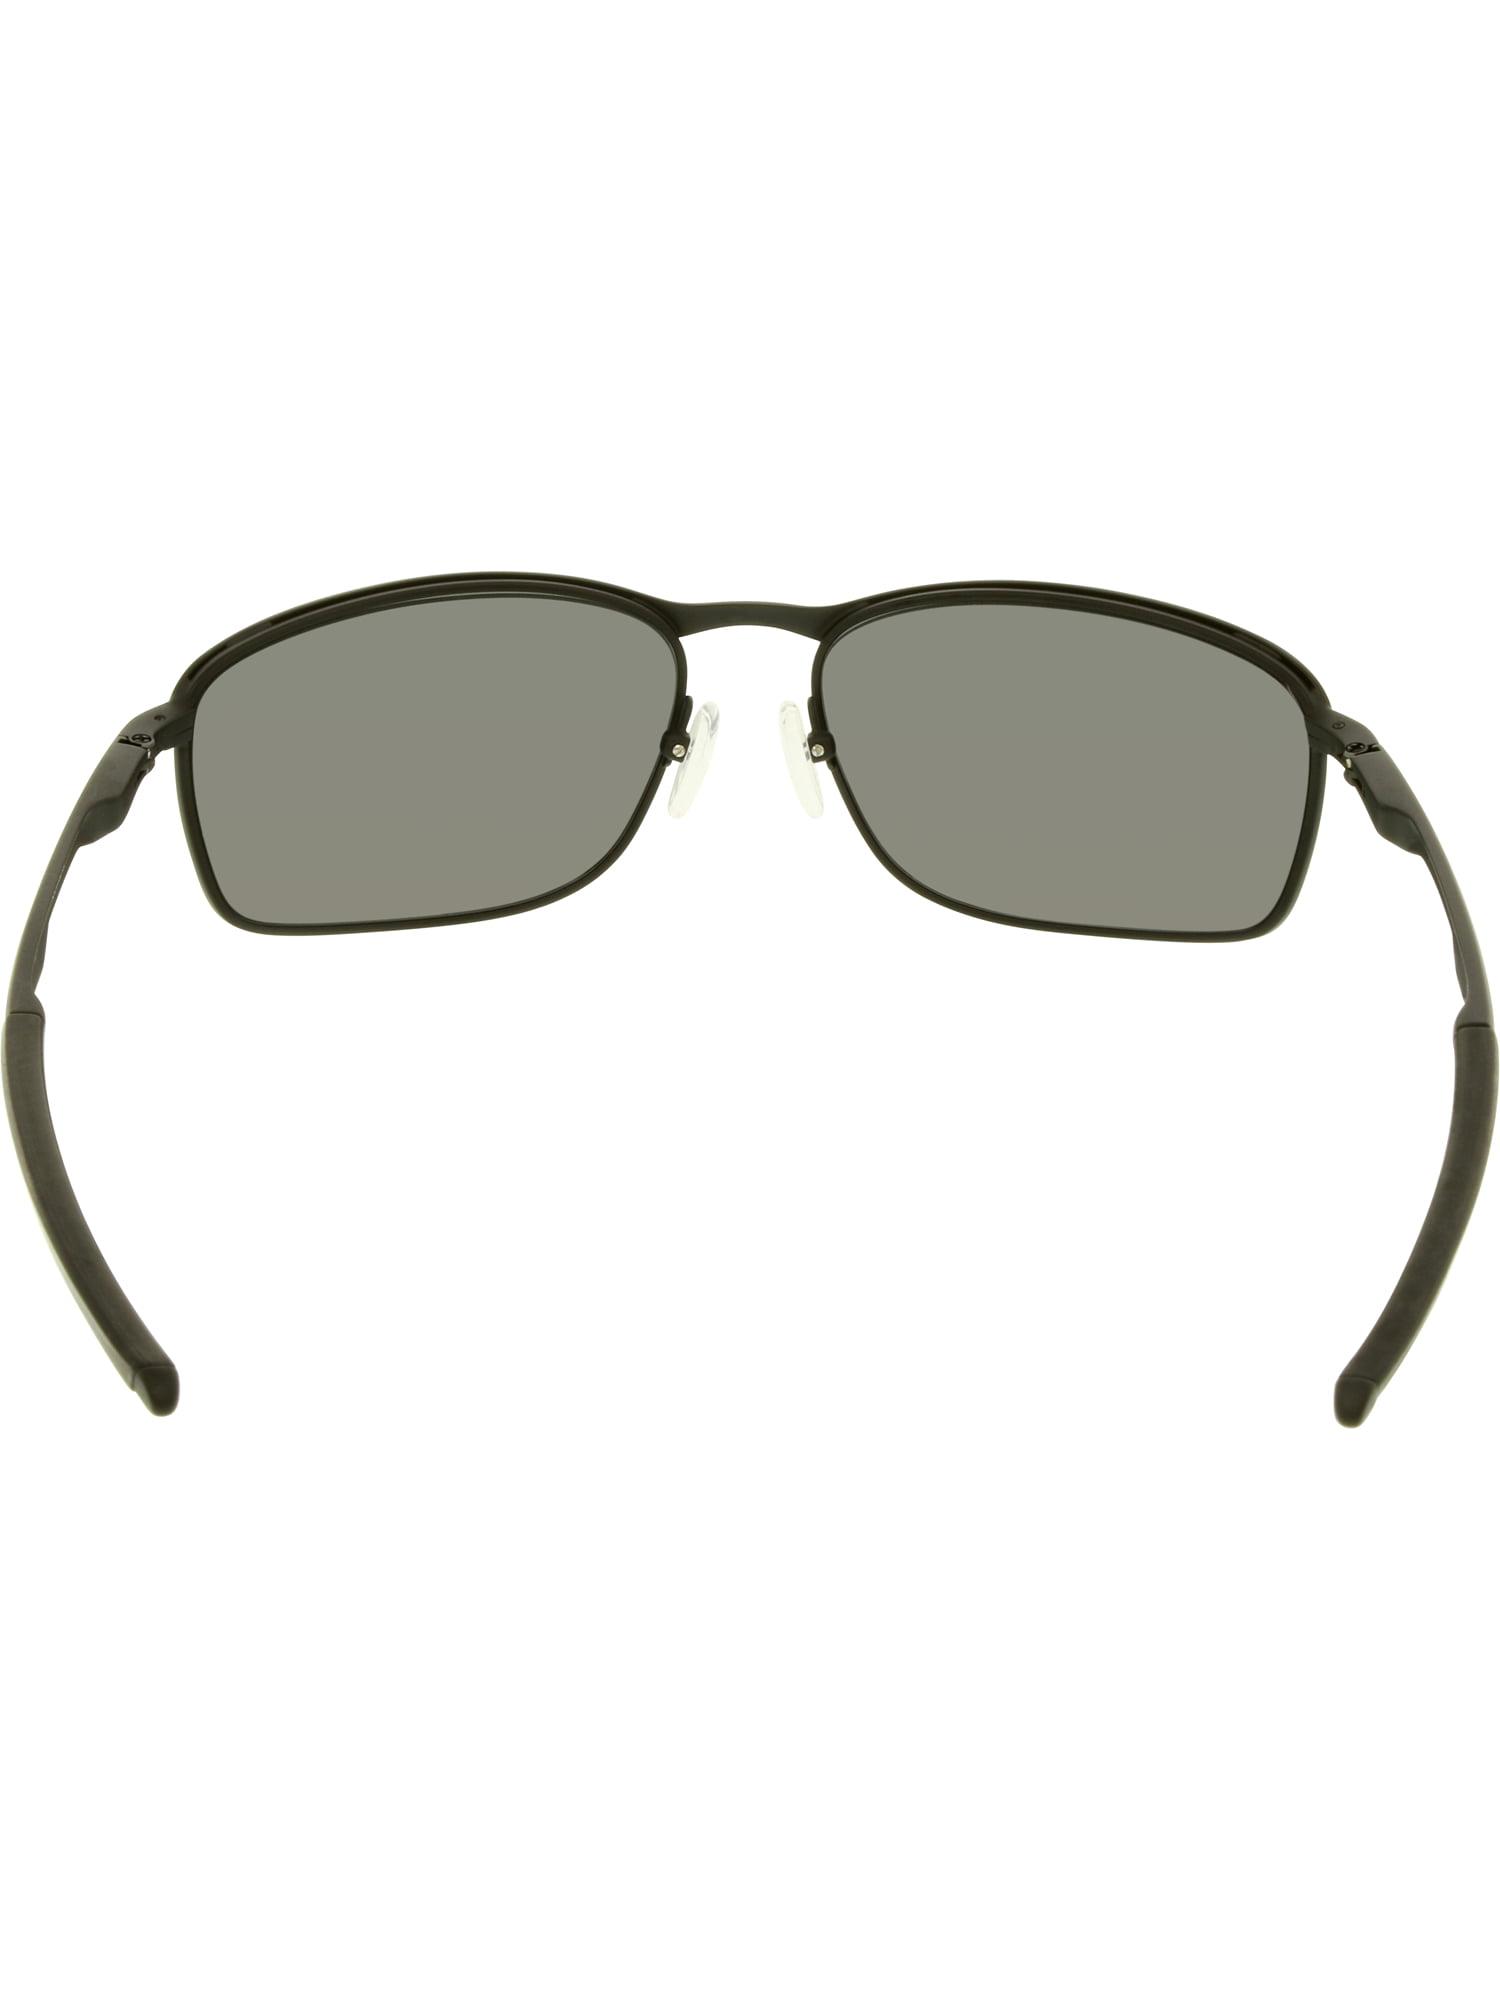 2edbf992d7 Oakley Men s Polarized Conductor 8 OO4107-02 Black Rectangle Sunglasses